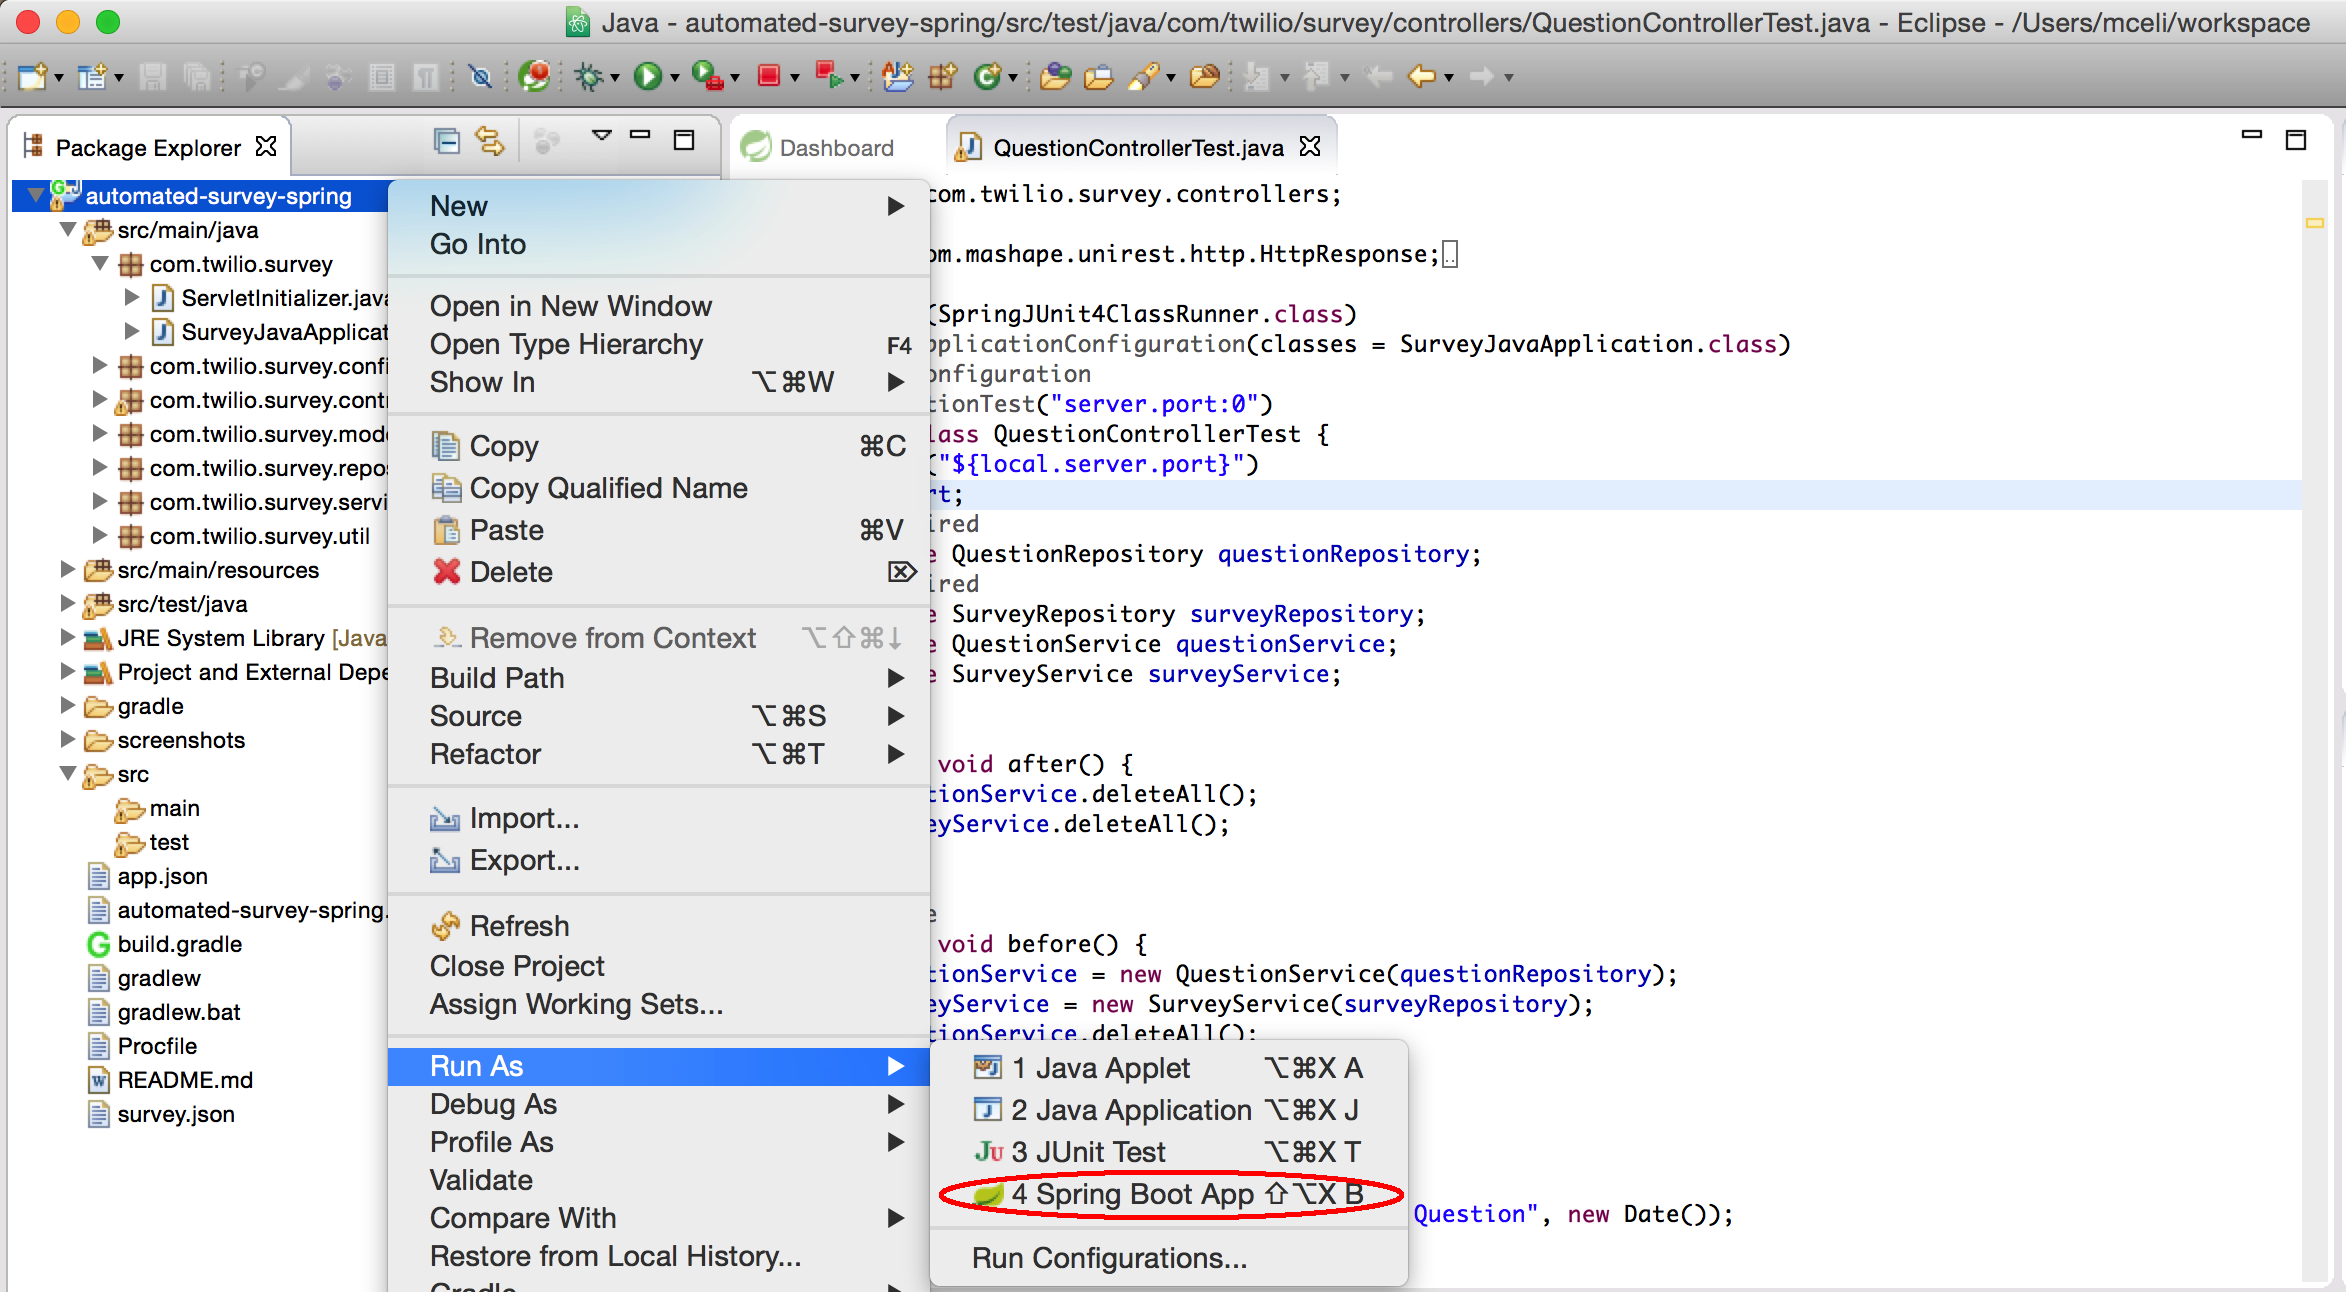 GitHub - TwilioDevEd/automated-survey-spring: Java Spring